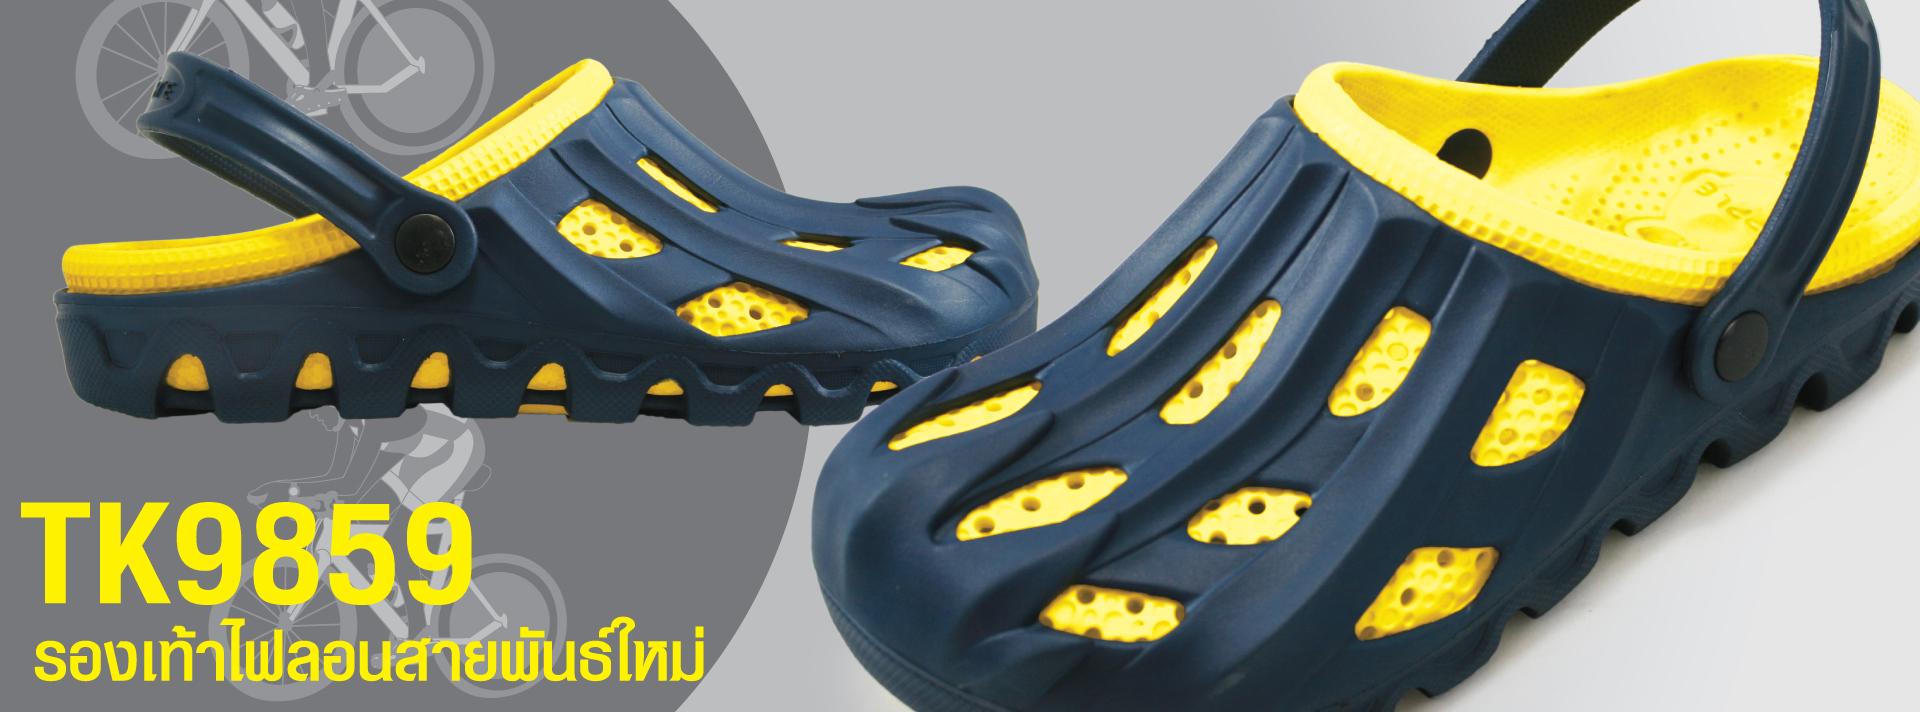 Shoes-TK9859